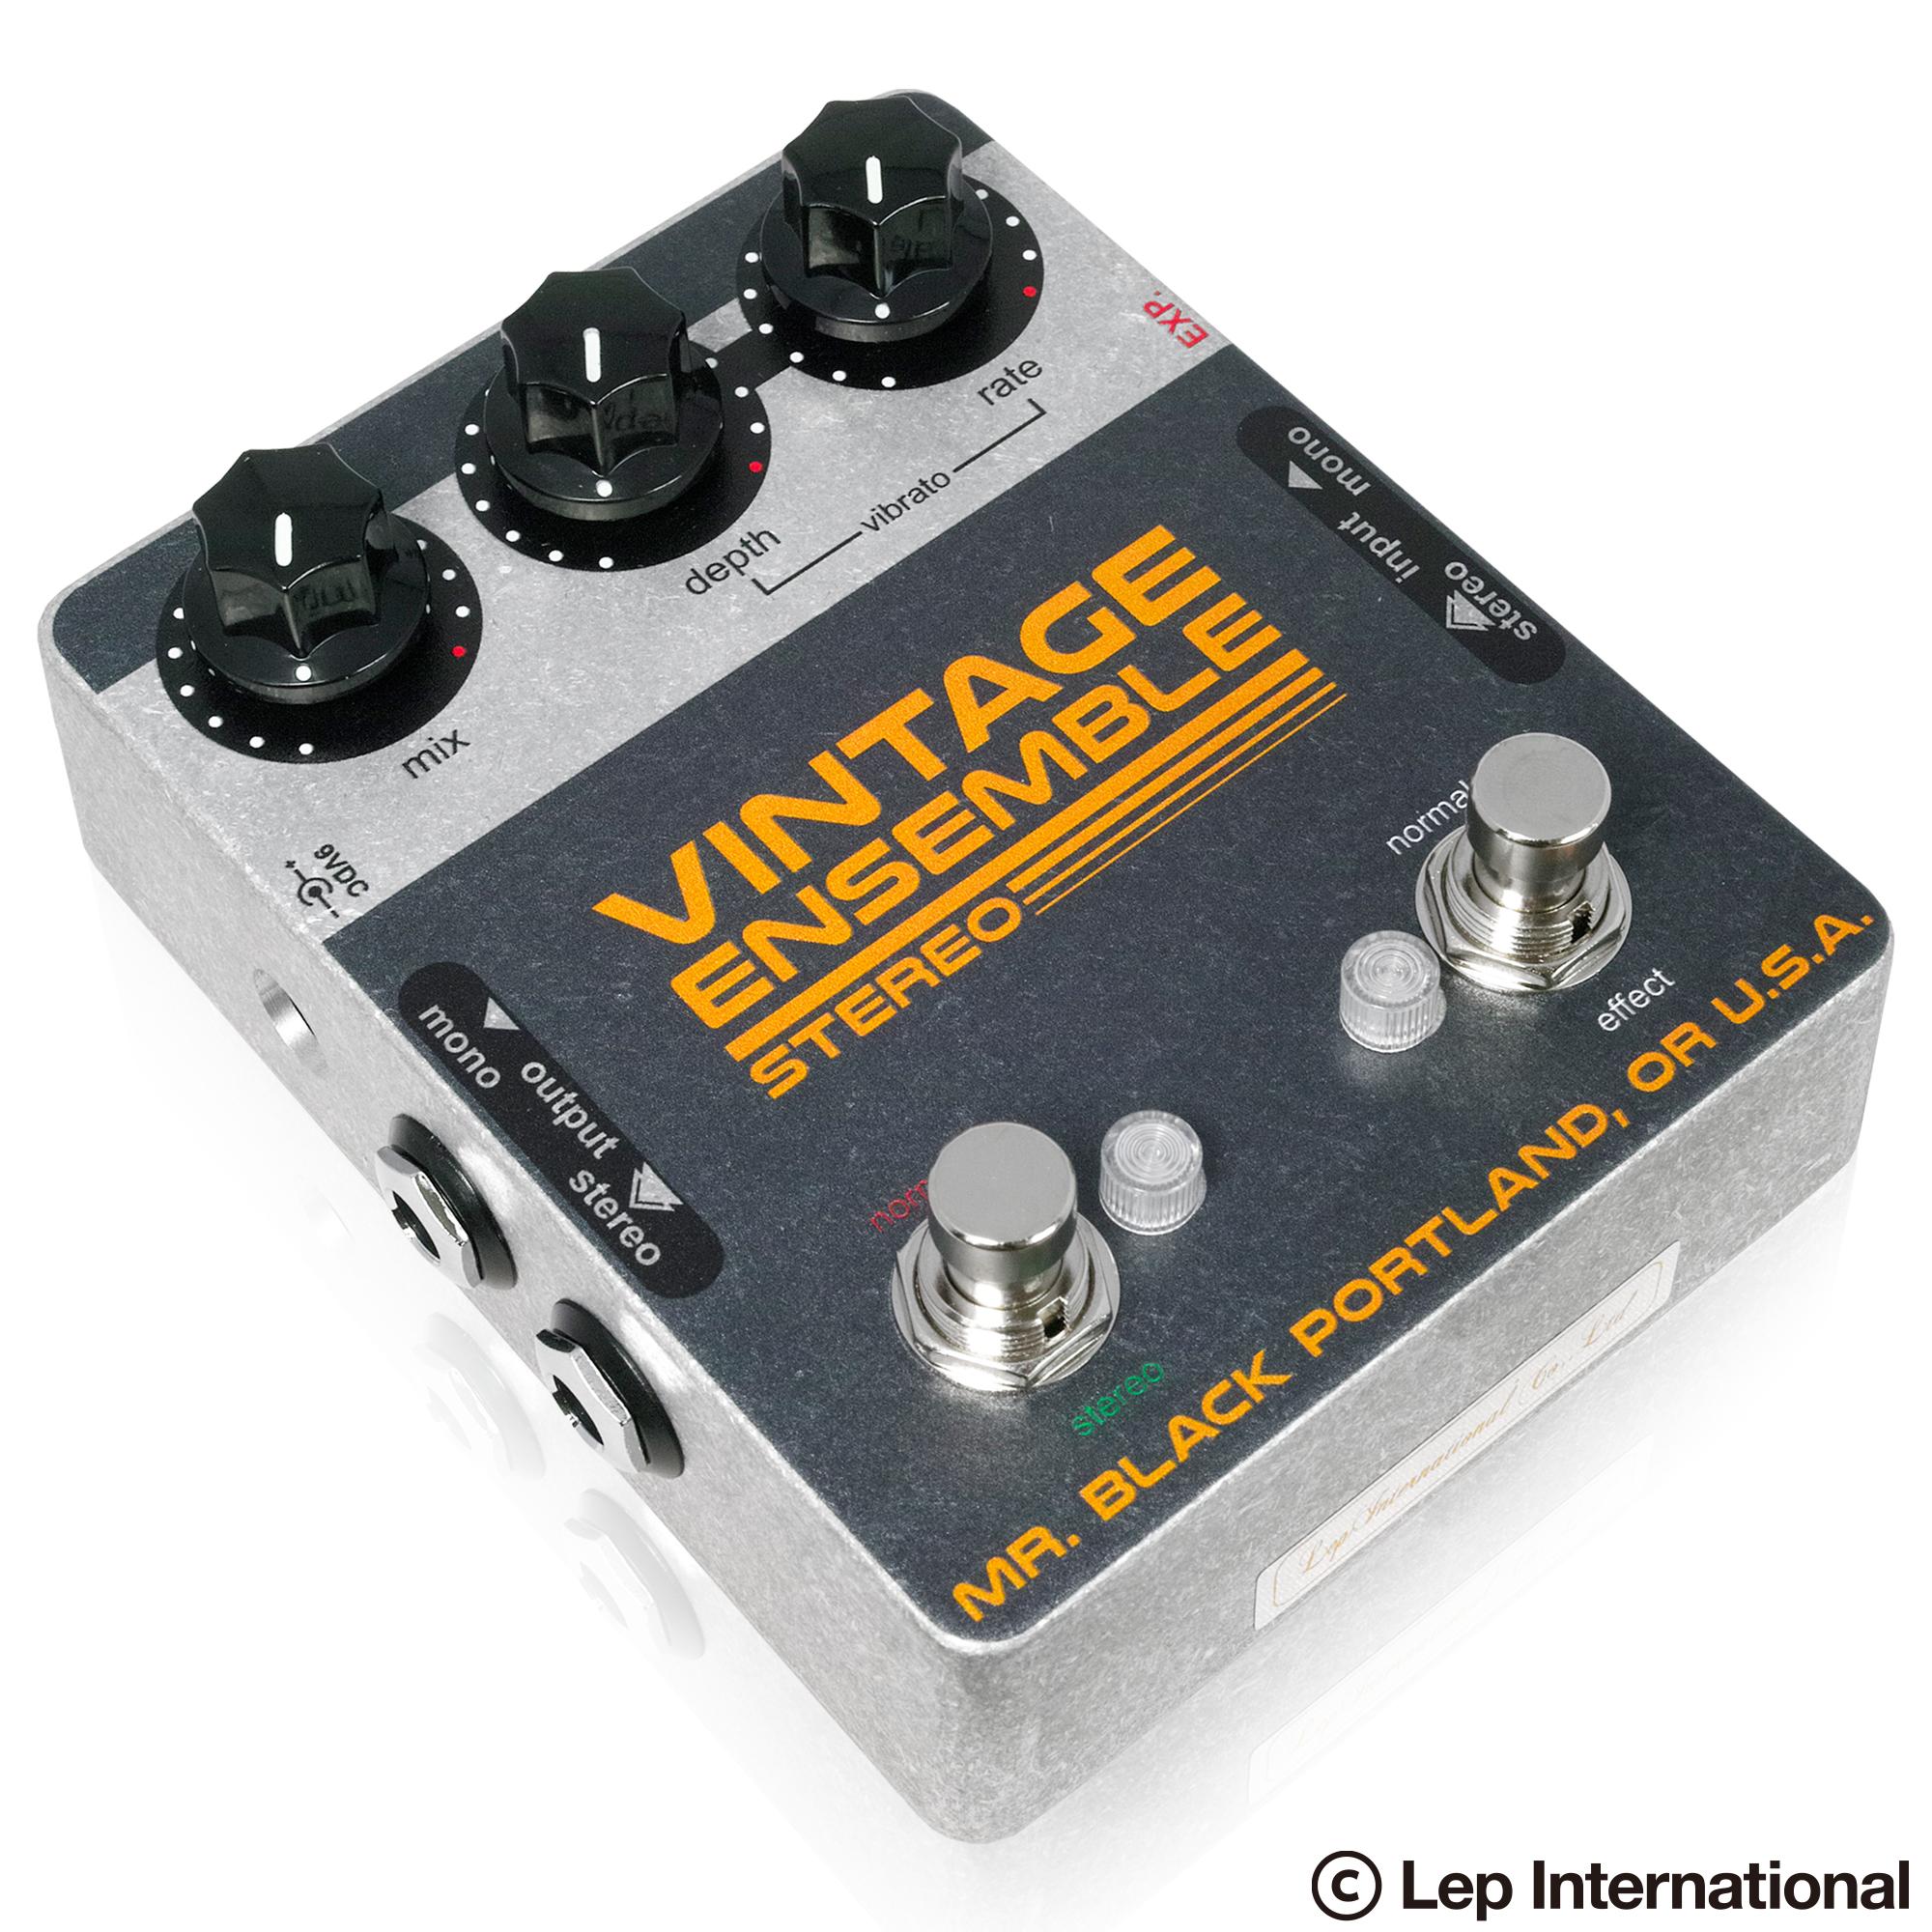 Stereo-Vintage-Ensemeble-03.jpg